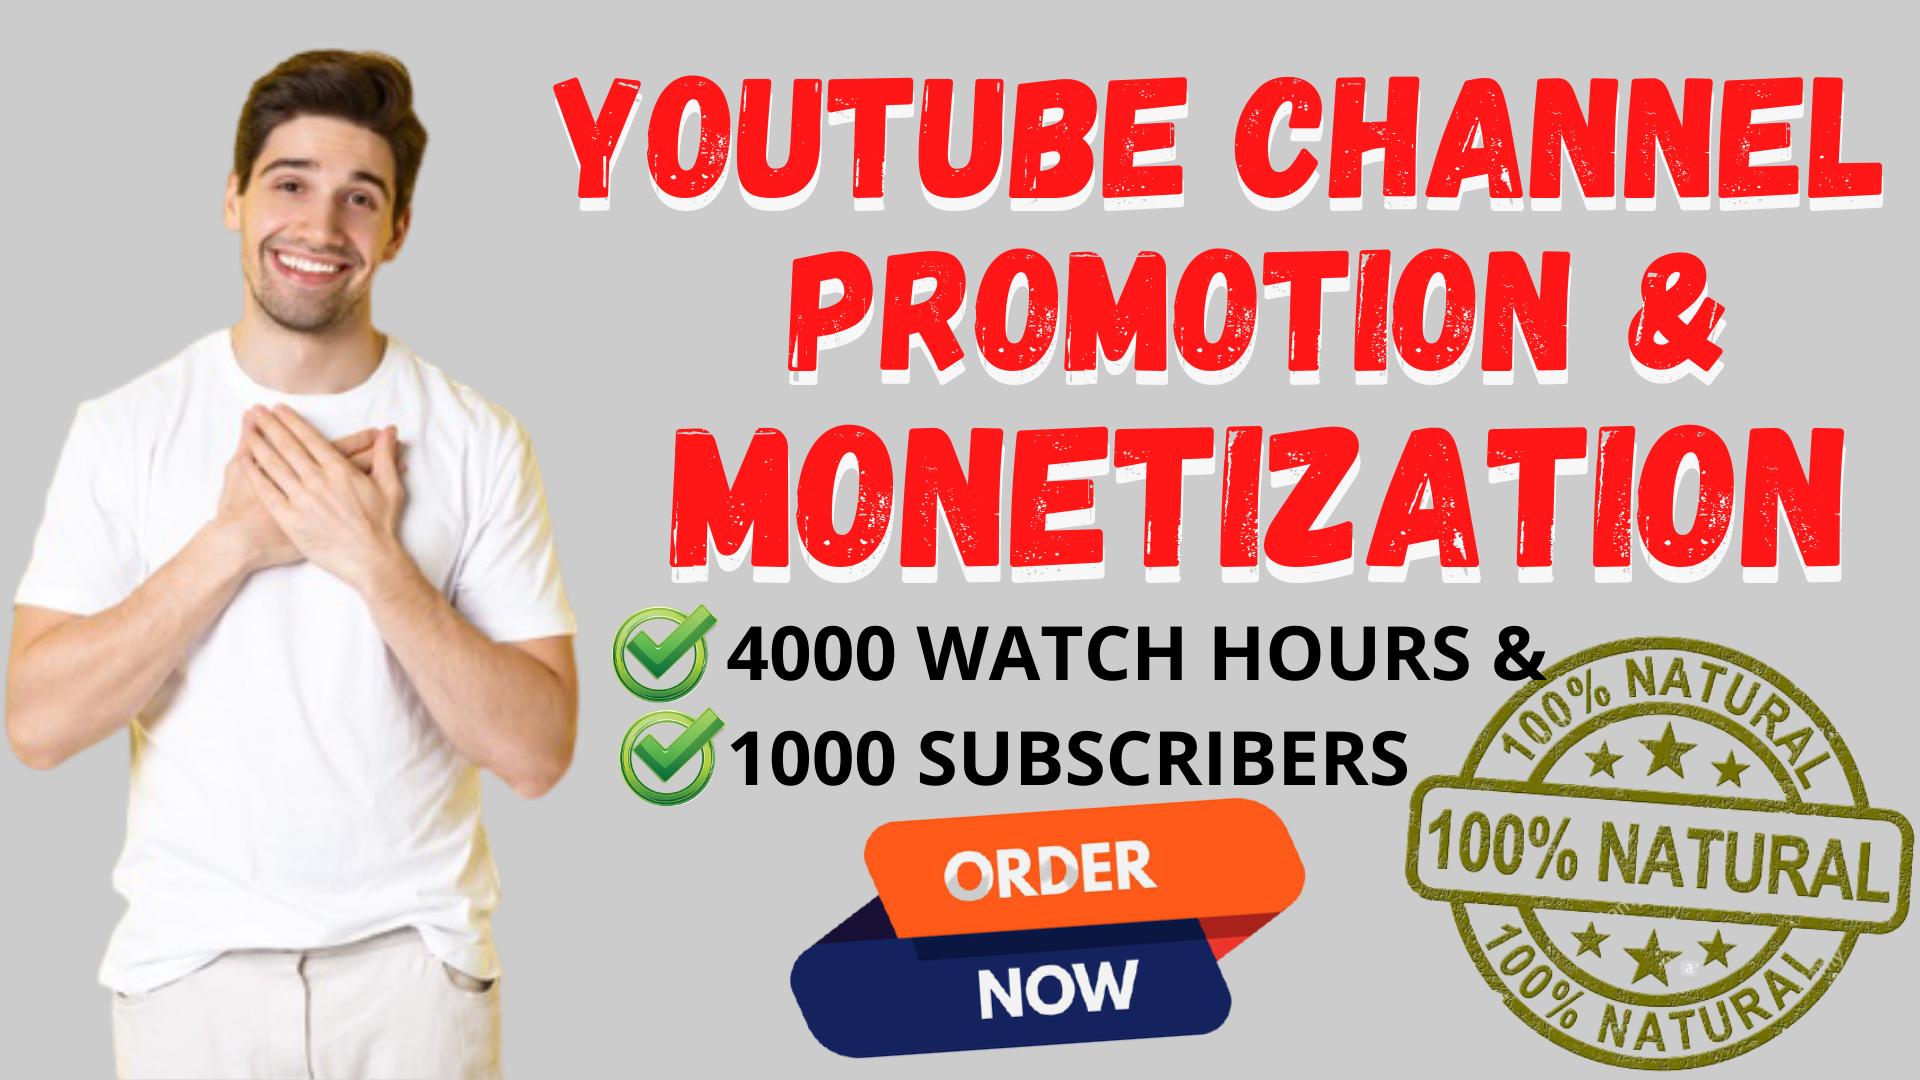 Do Youtube Promotion For Monetization